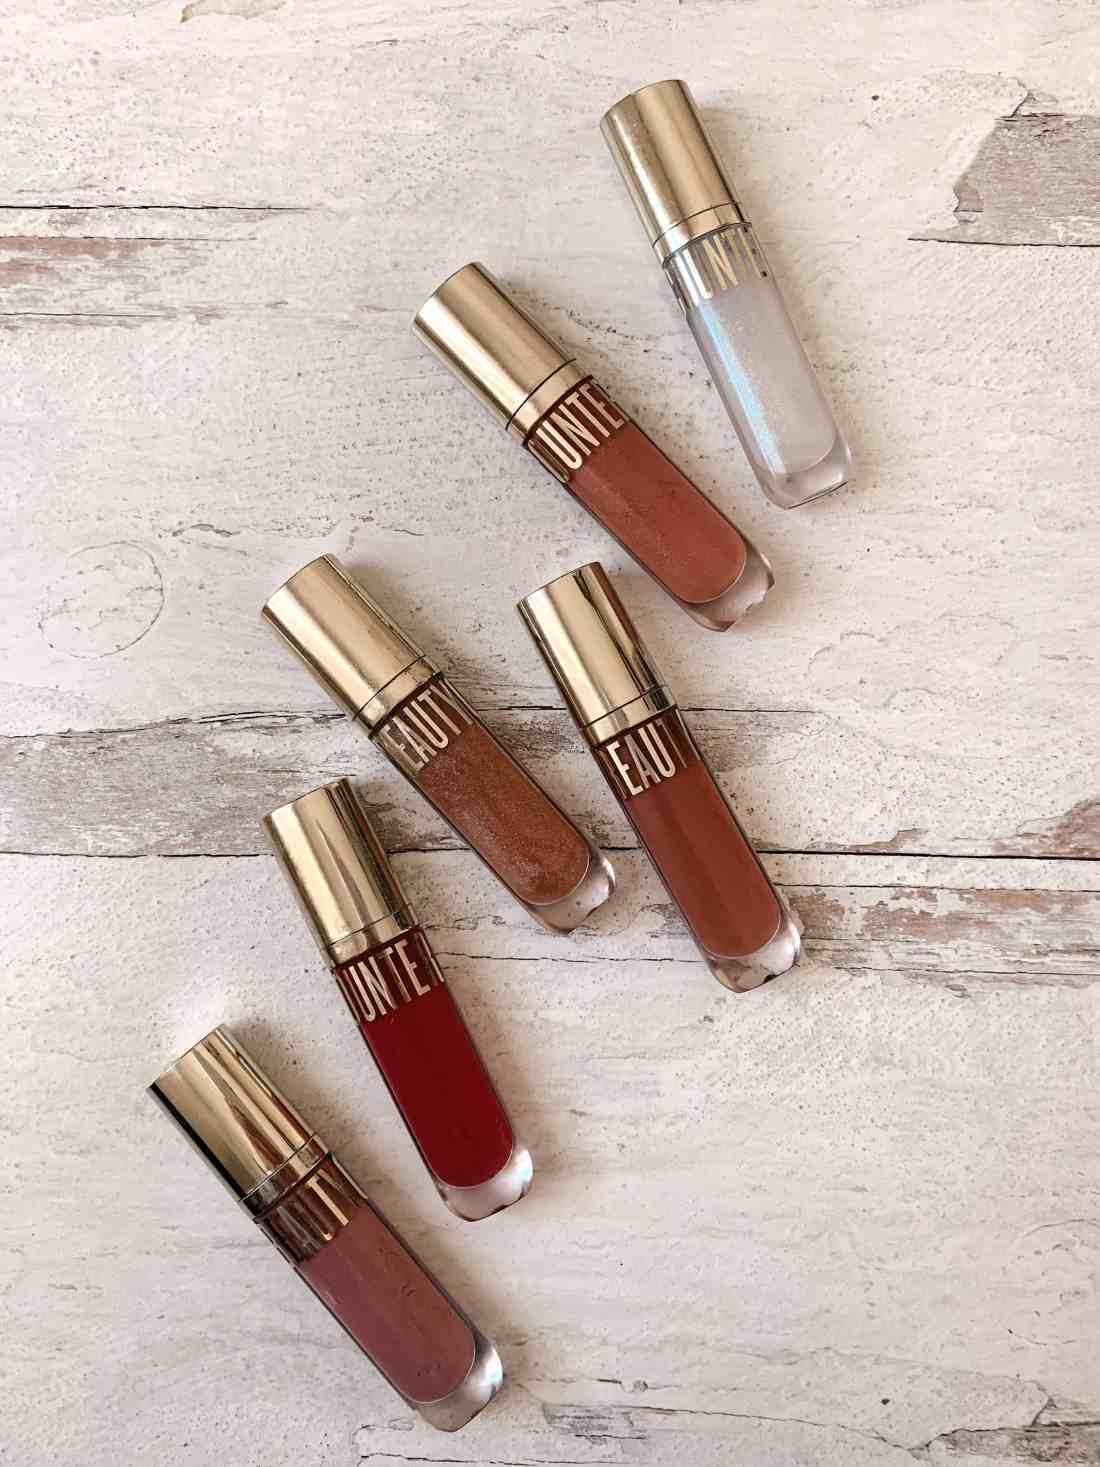 6 Beautycounter Beyond Gloss Lipglosses on a white wood background